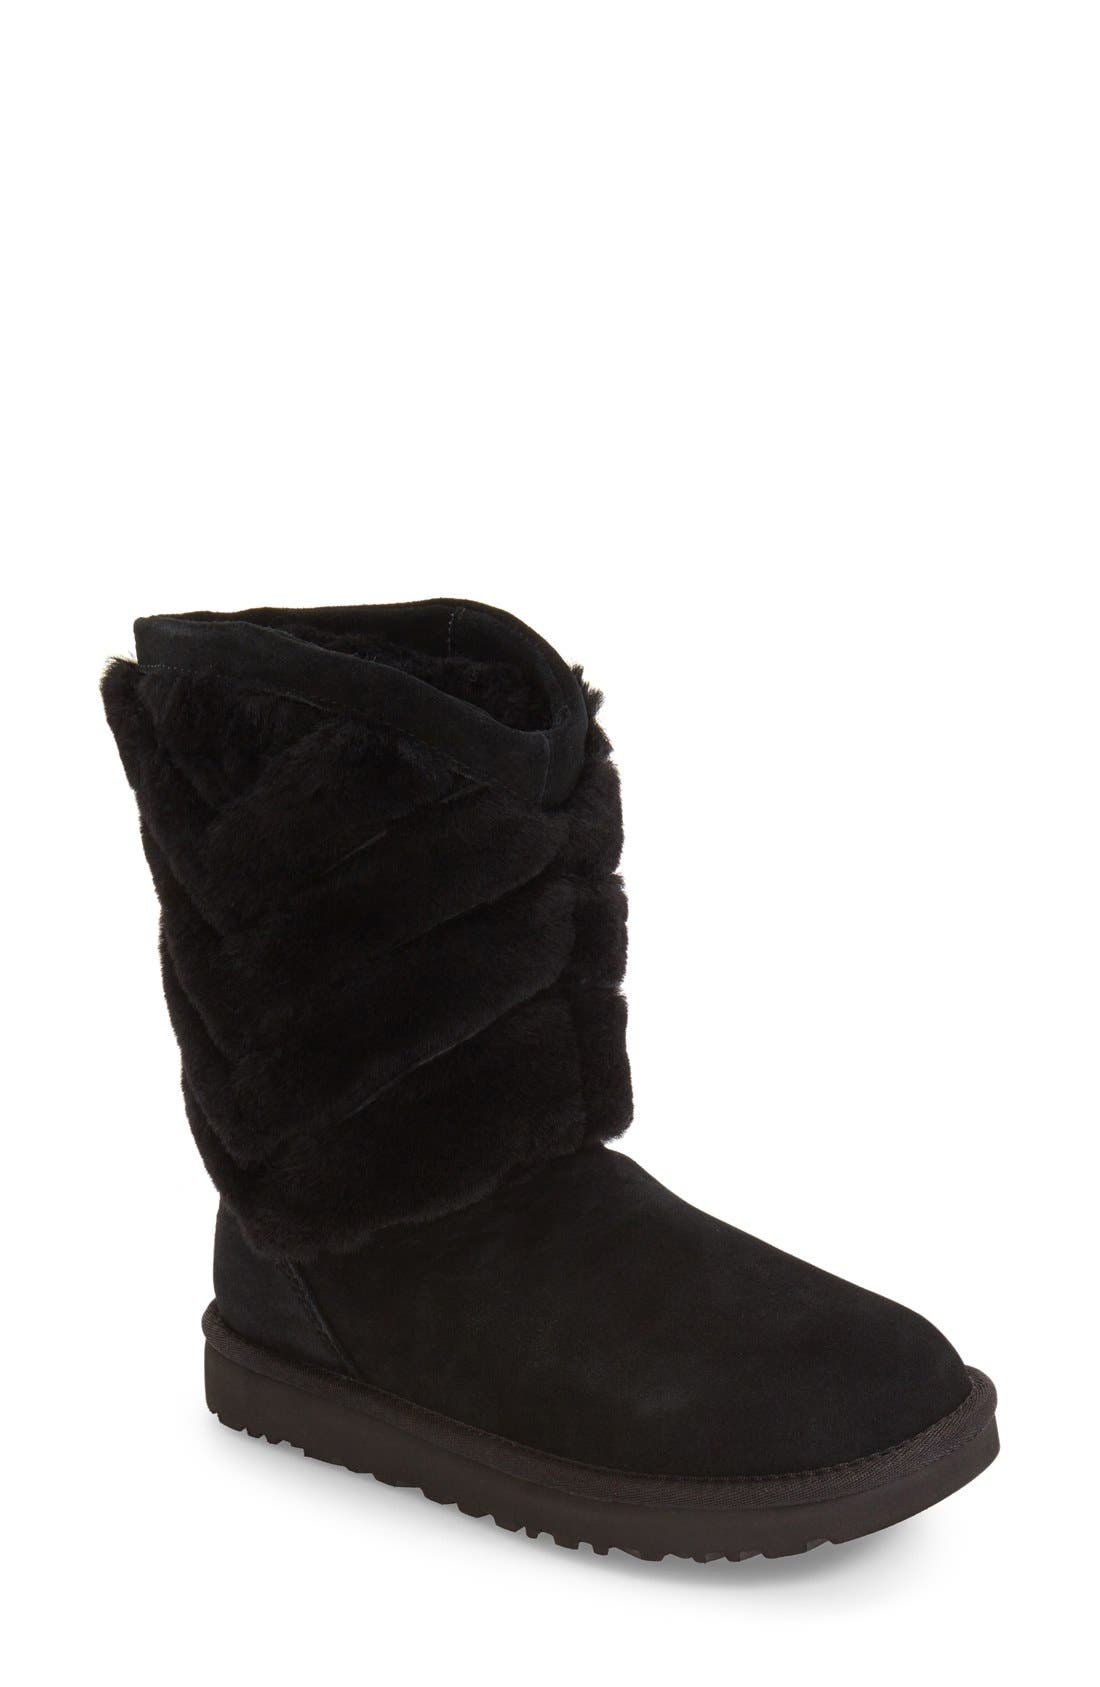 UGG<SUP>®</SUP> Tania Genuine Shearling Boot, Main, color, 001